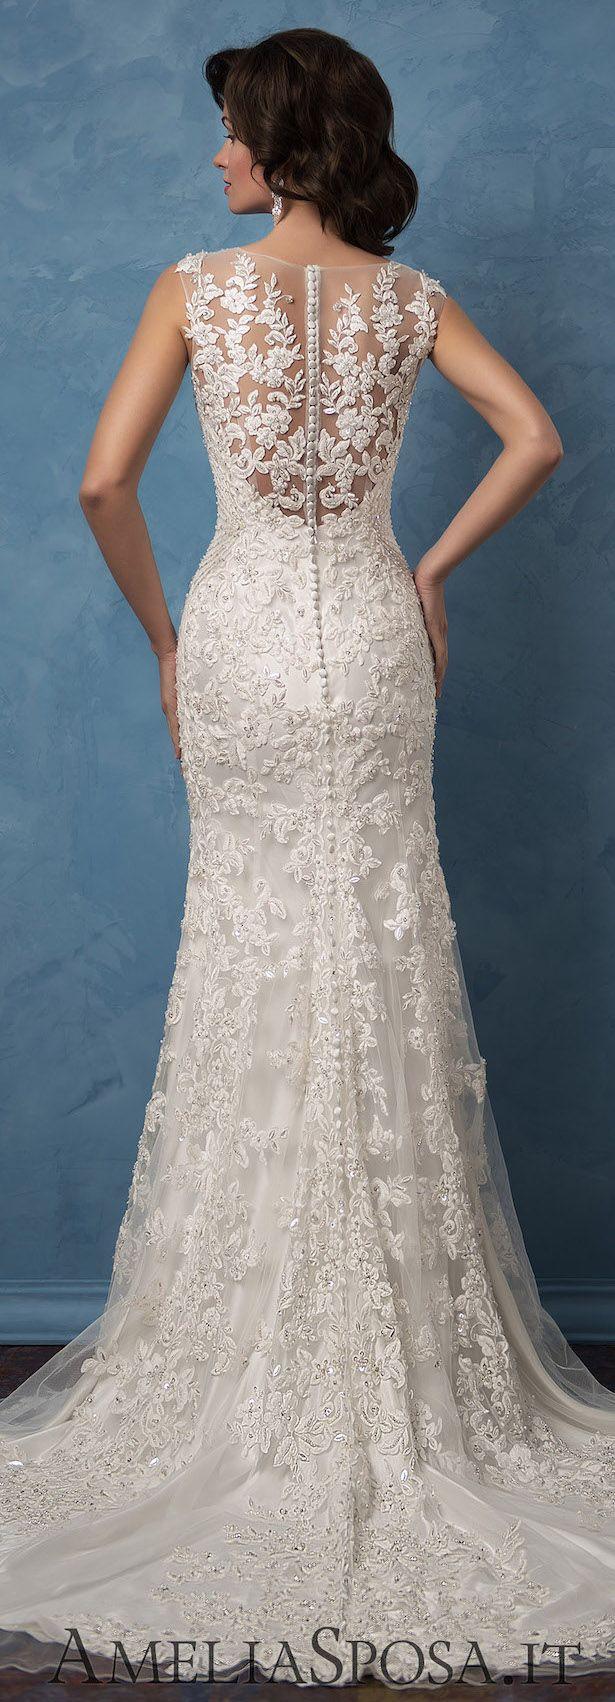 Amelia sposa wedding dresses royal blue collection